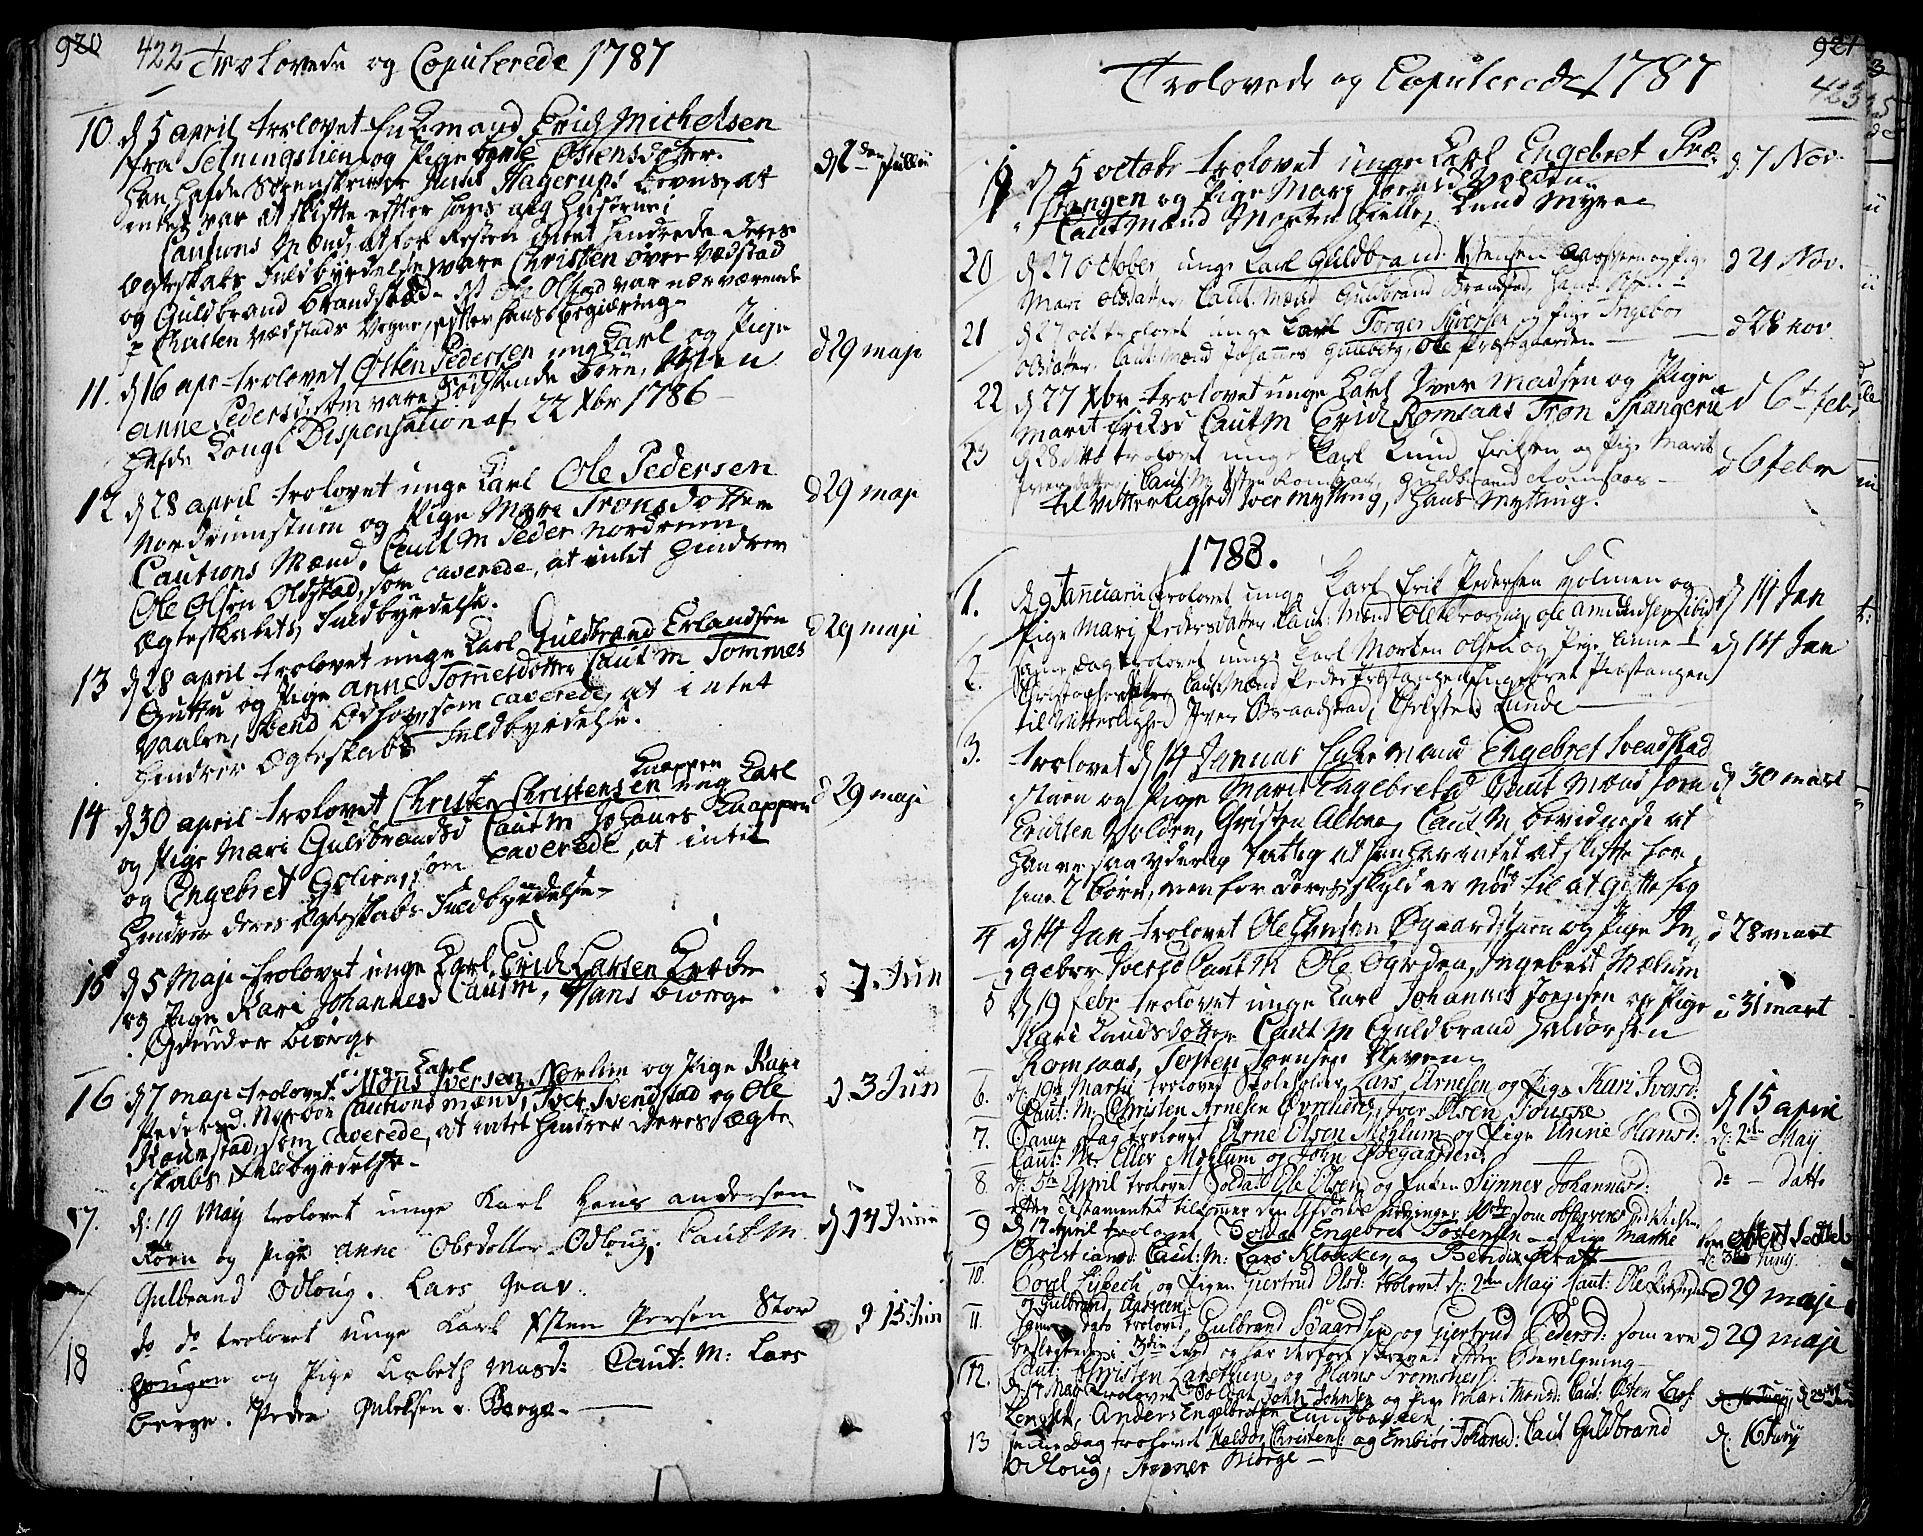 SAH, Ringebu prestekontor, Ministerialbok nr. 3, 1781-1820, s. 422-423